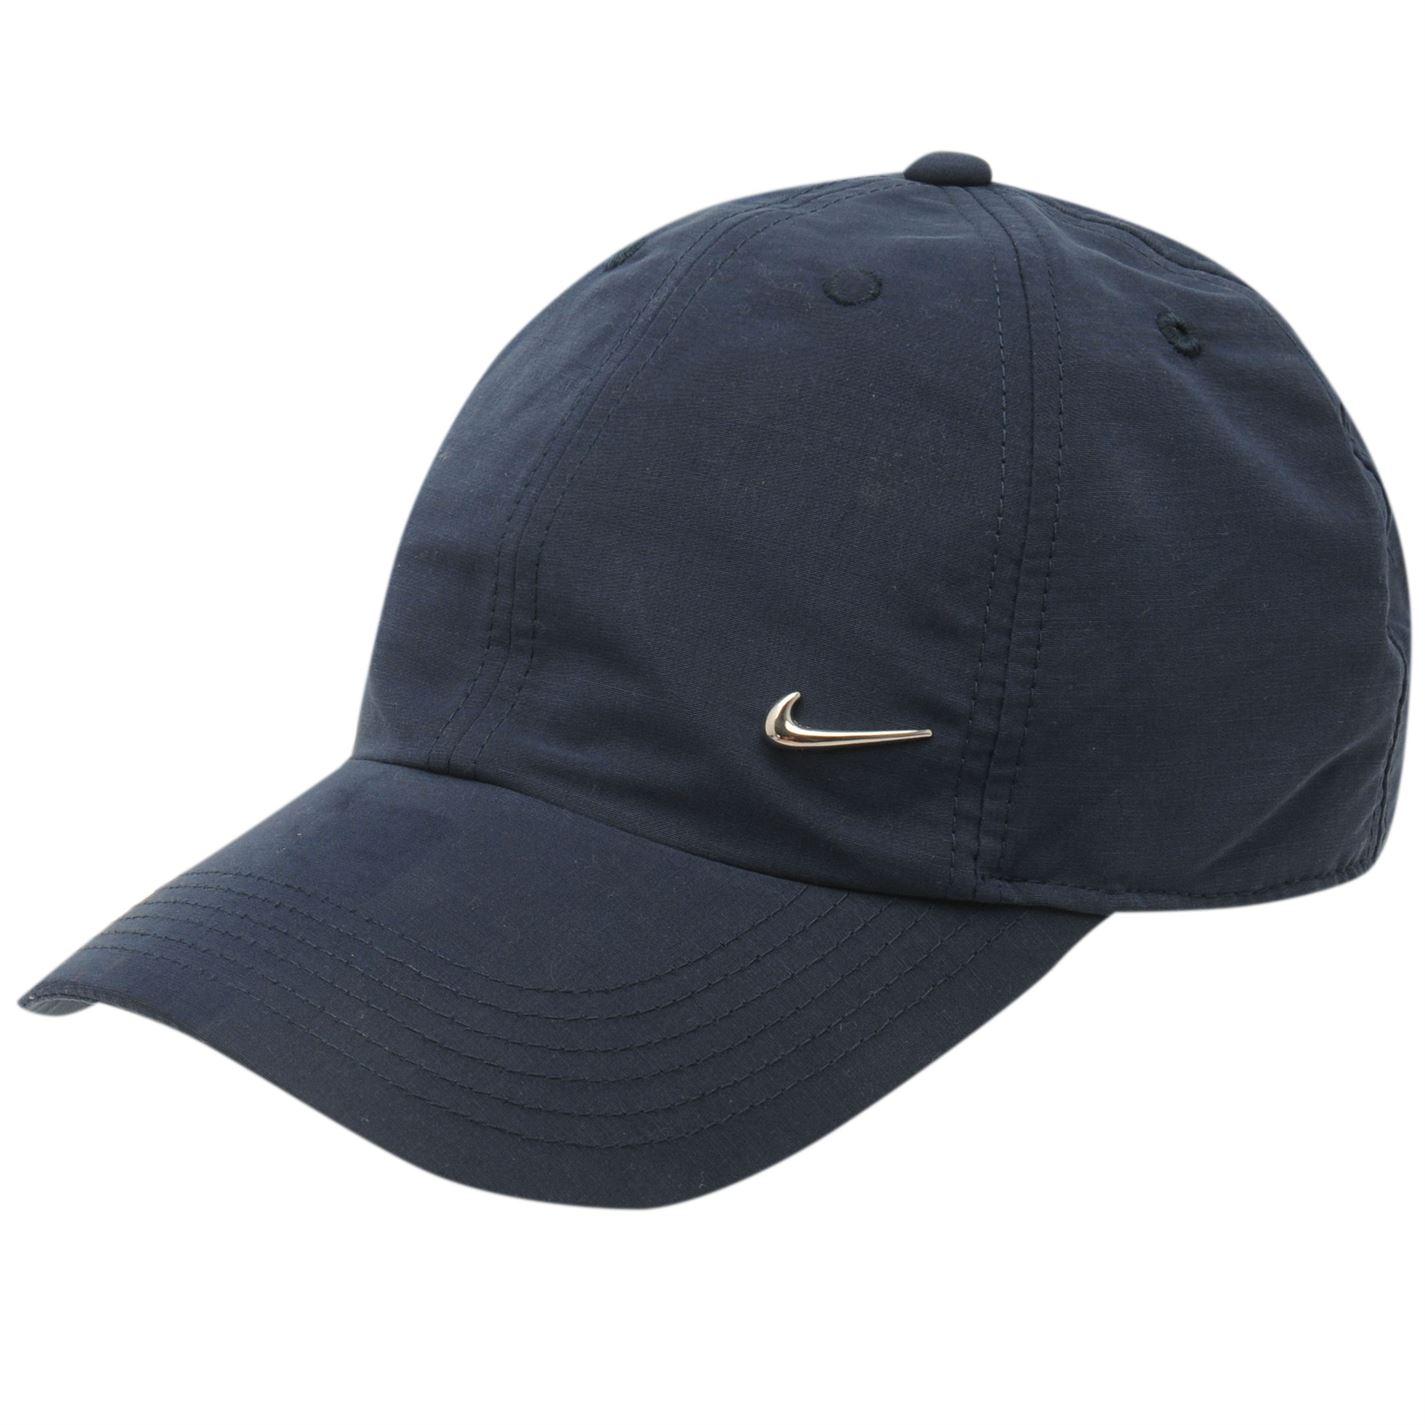 bba37eb1b18 ... Nike Met Swoosh Cap Junior. -7%. Šiltovka ...